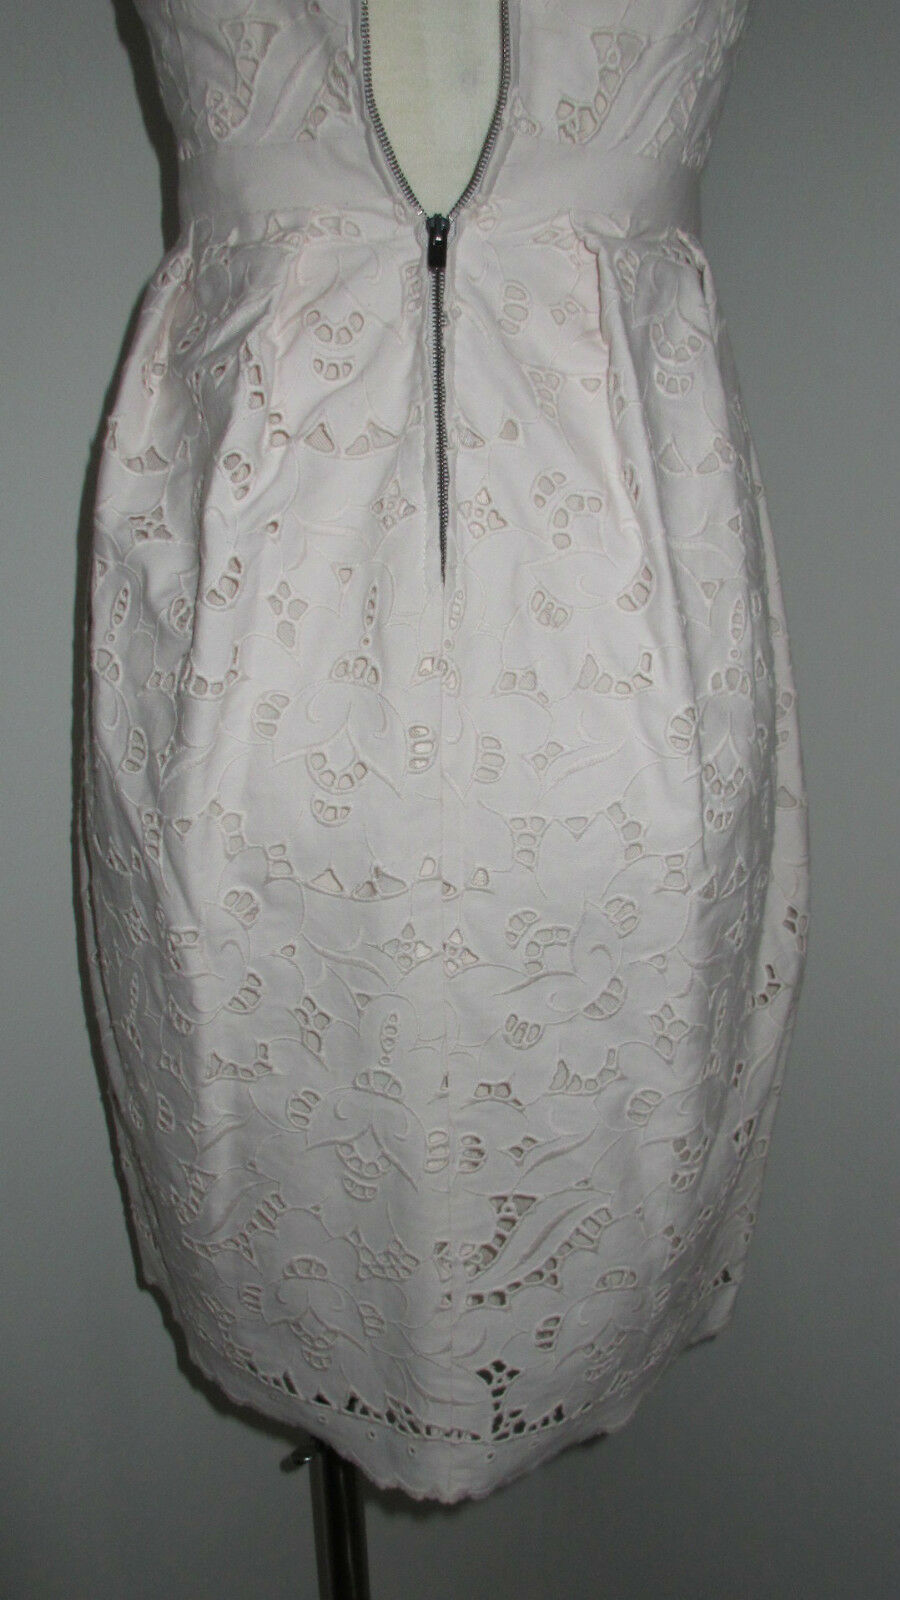 STELLA MCCARTNEY CREAM DEWBERRY DEWBERRY DEWBERRY COTTON LACE DRESS It 38 2 b4149e